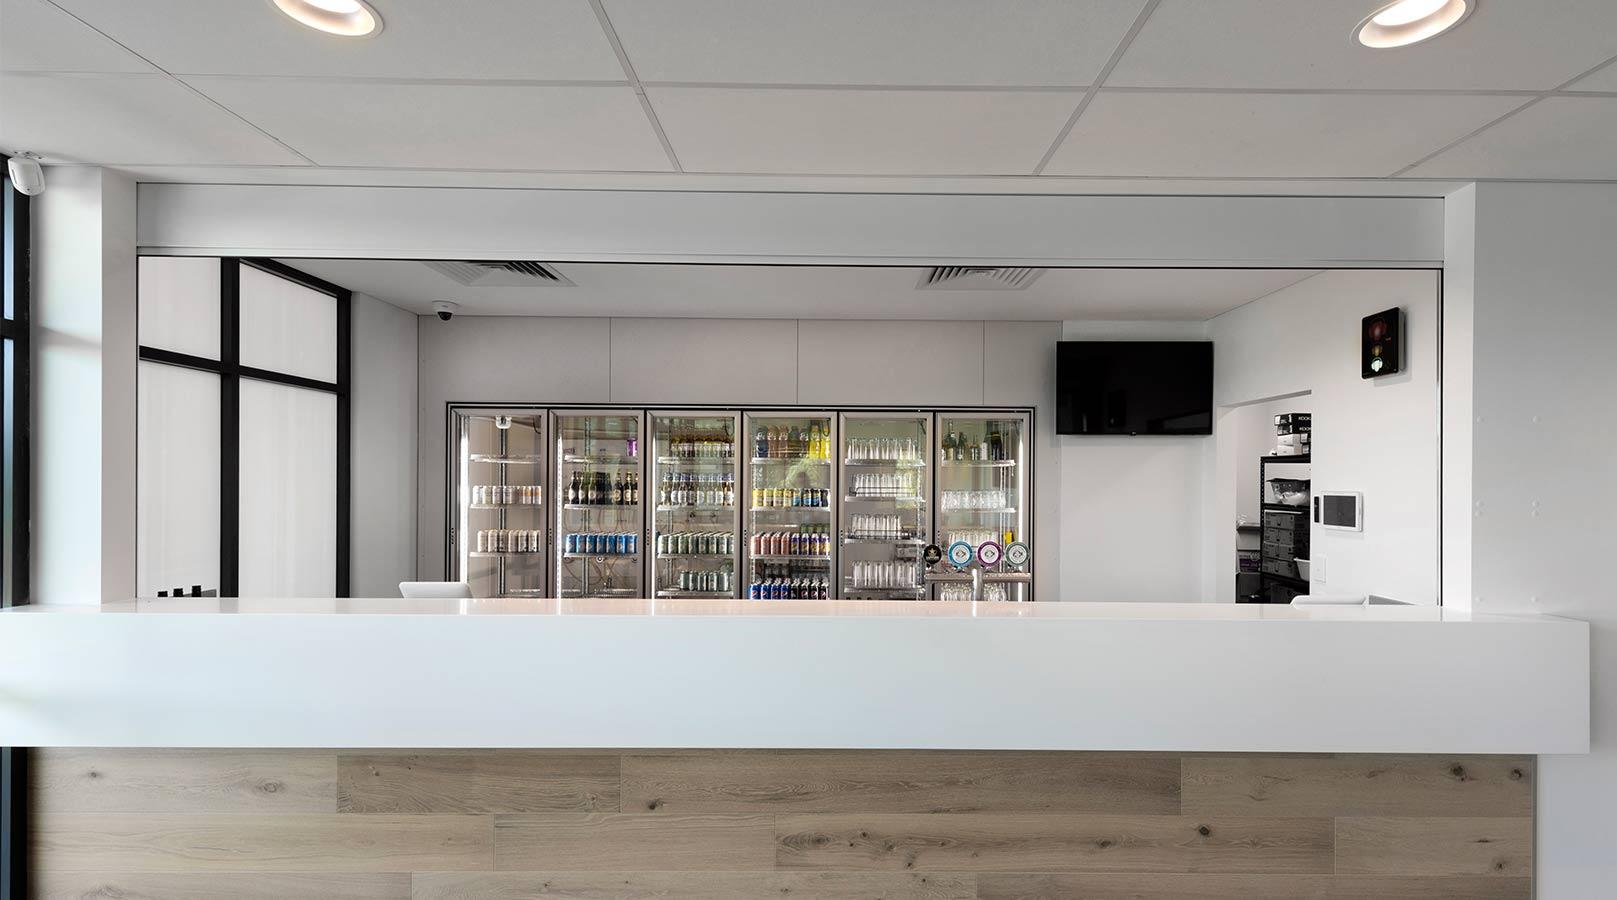 schiavello construction adelaide goodwood oval sport stadium bar